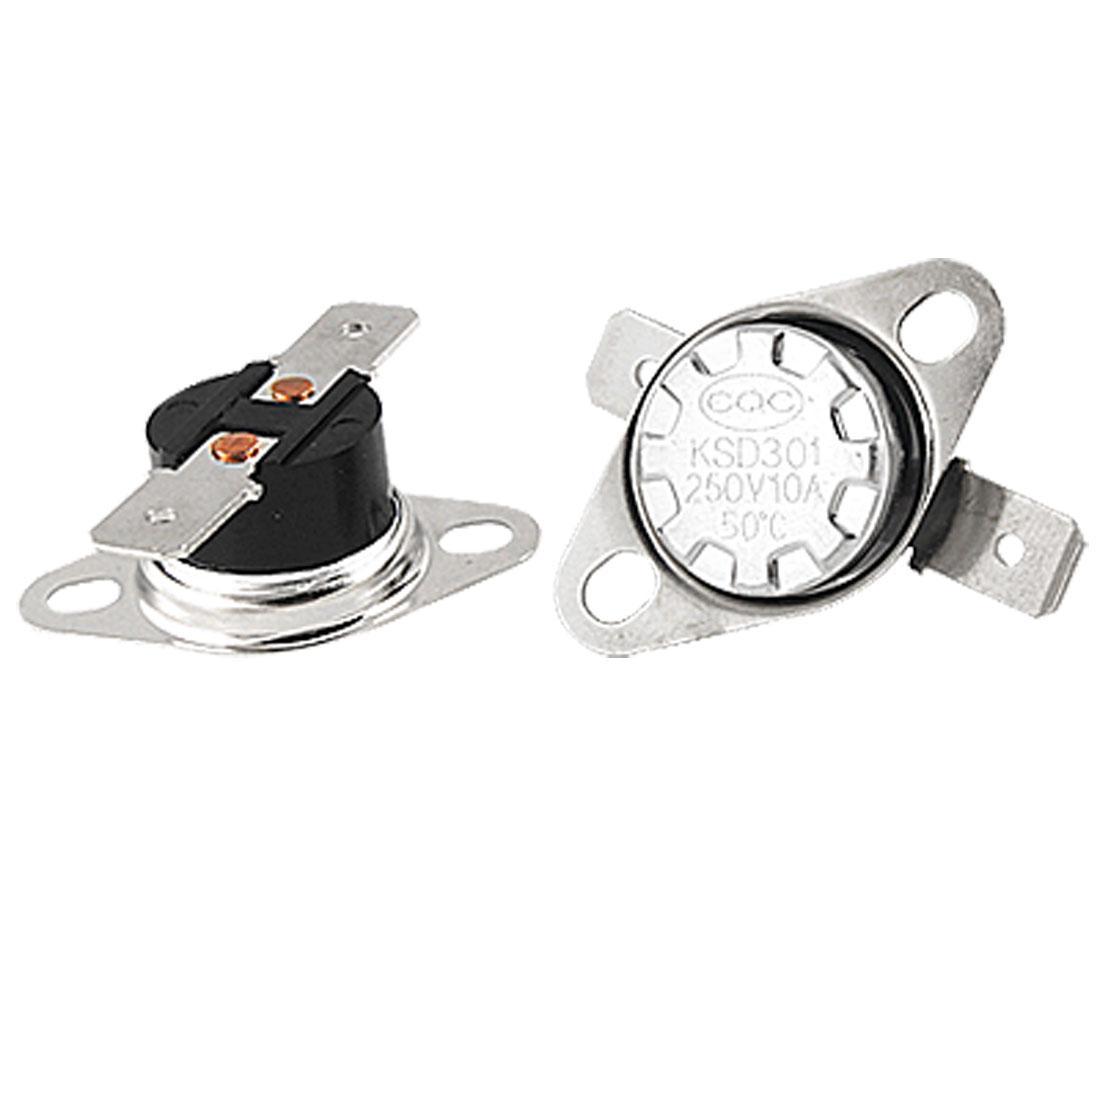 5 x KSD301 Temperature Control Switch Thermostat 50 Celsius N.C